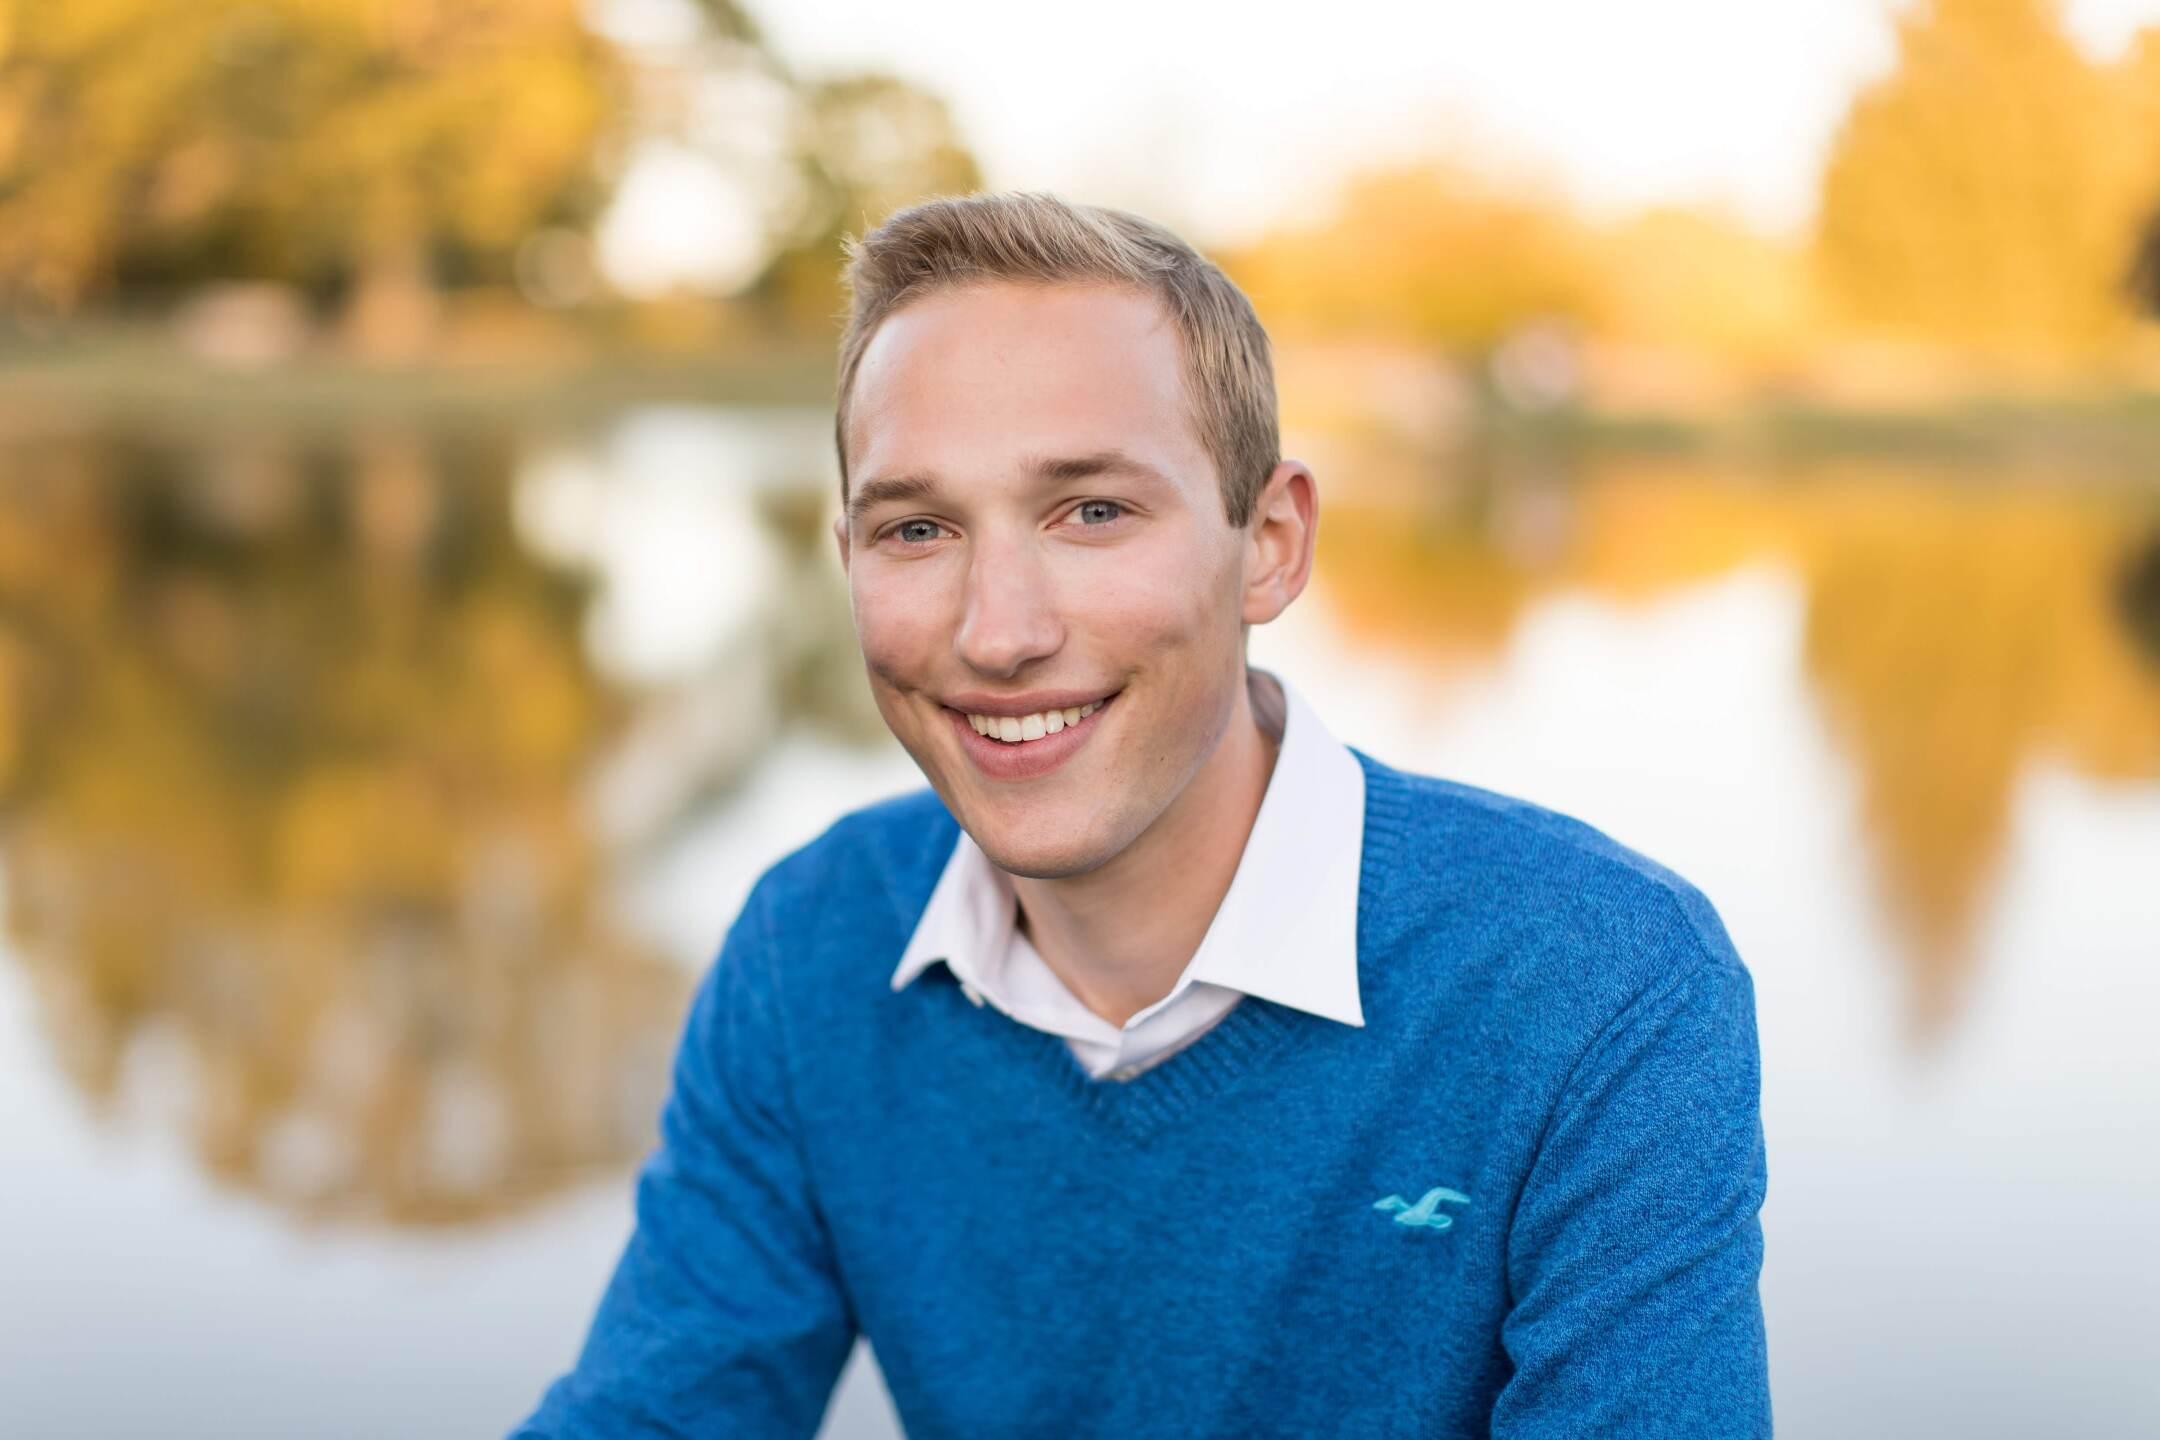 Nicholas Haehn, Springboro High School